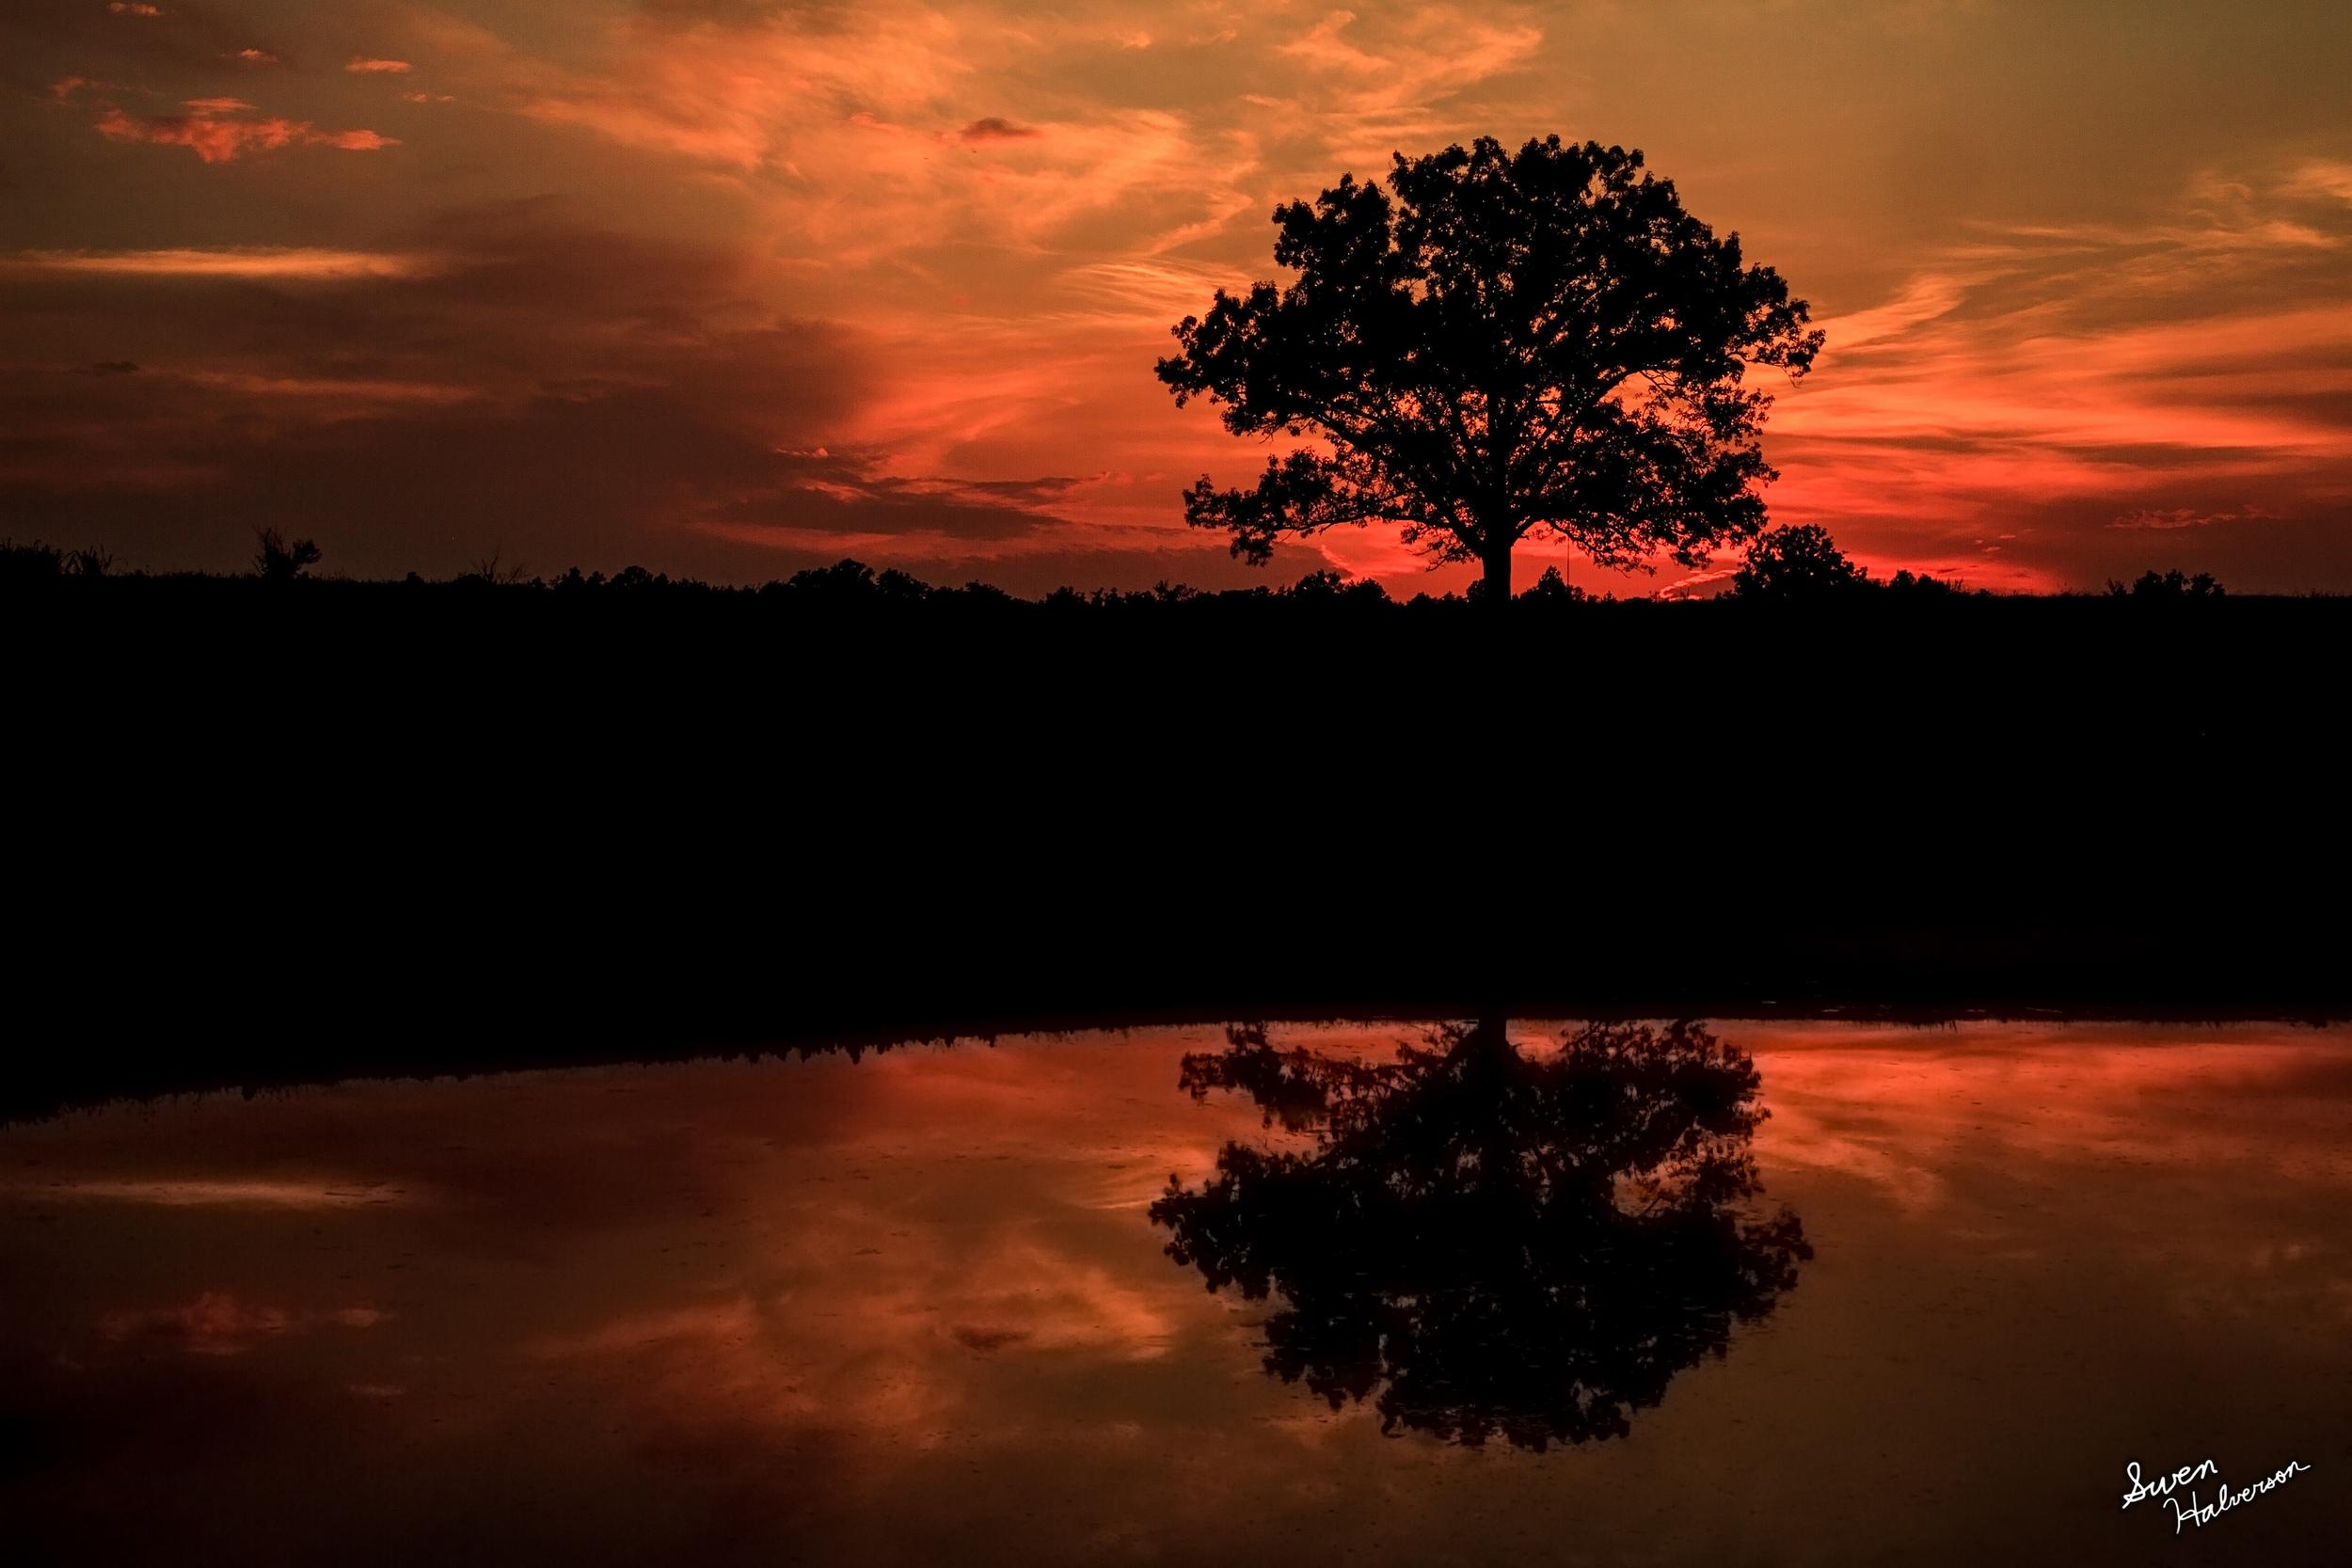 Theme: Peace <br>Title: Peaceful Sunset